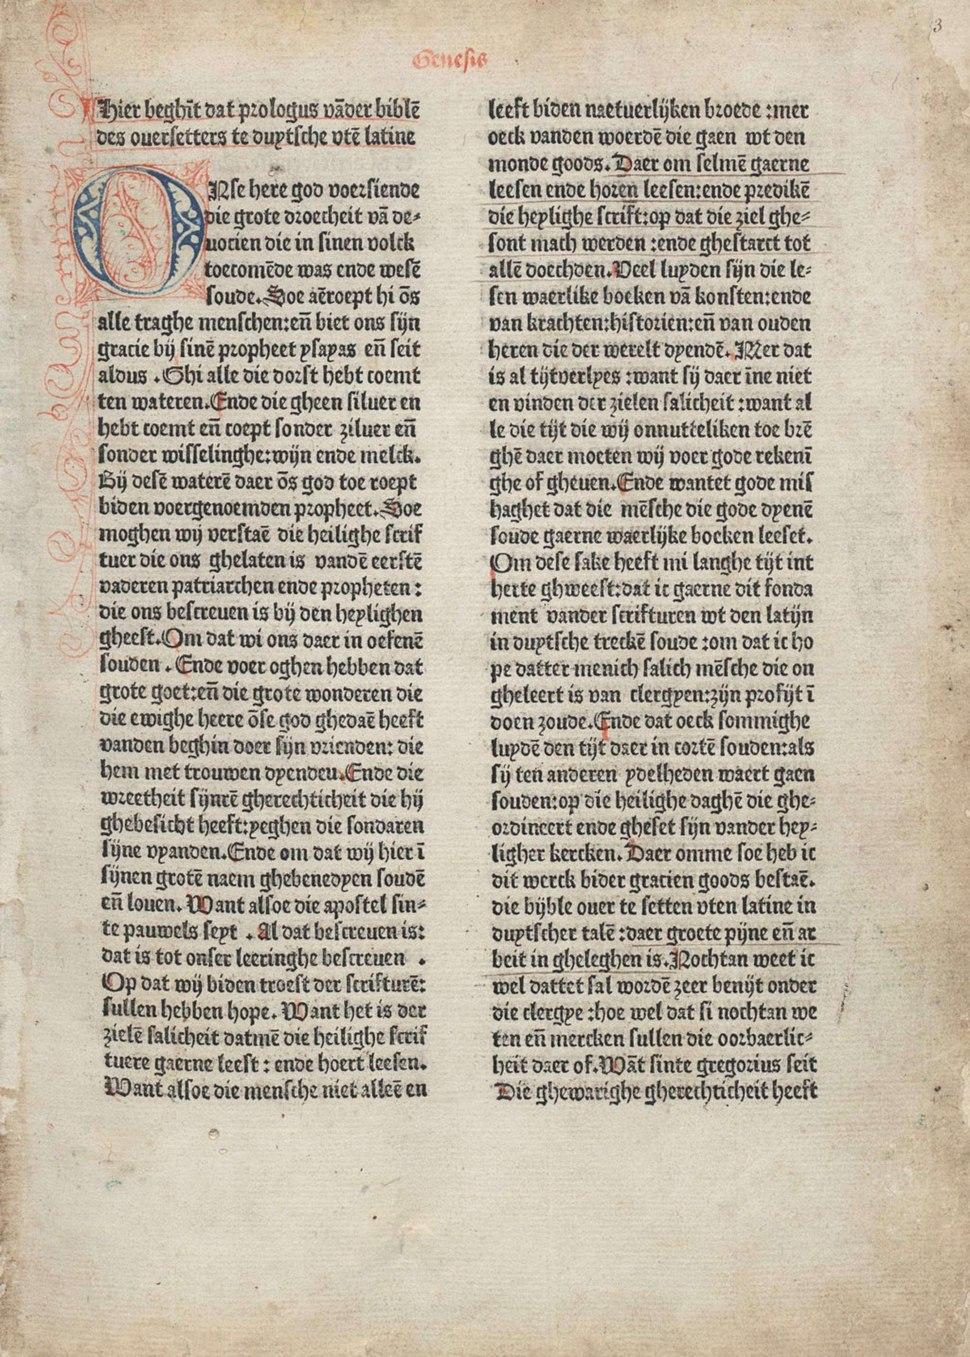 Delftse bijbel (proloog 1)